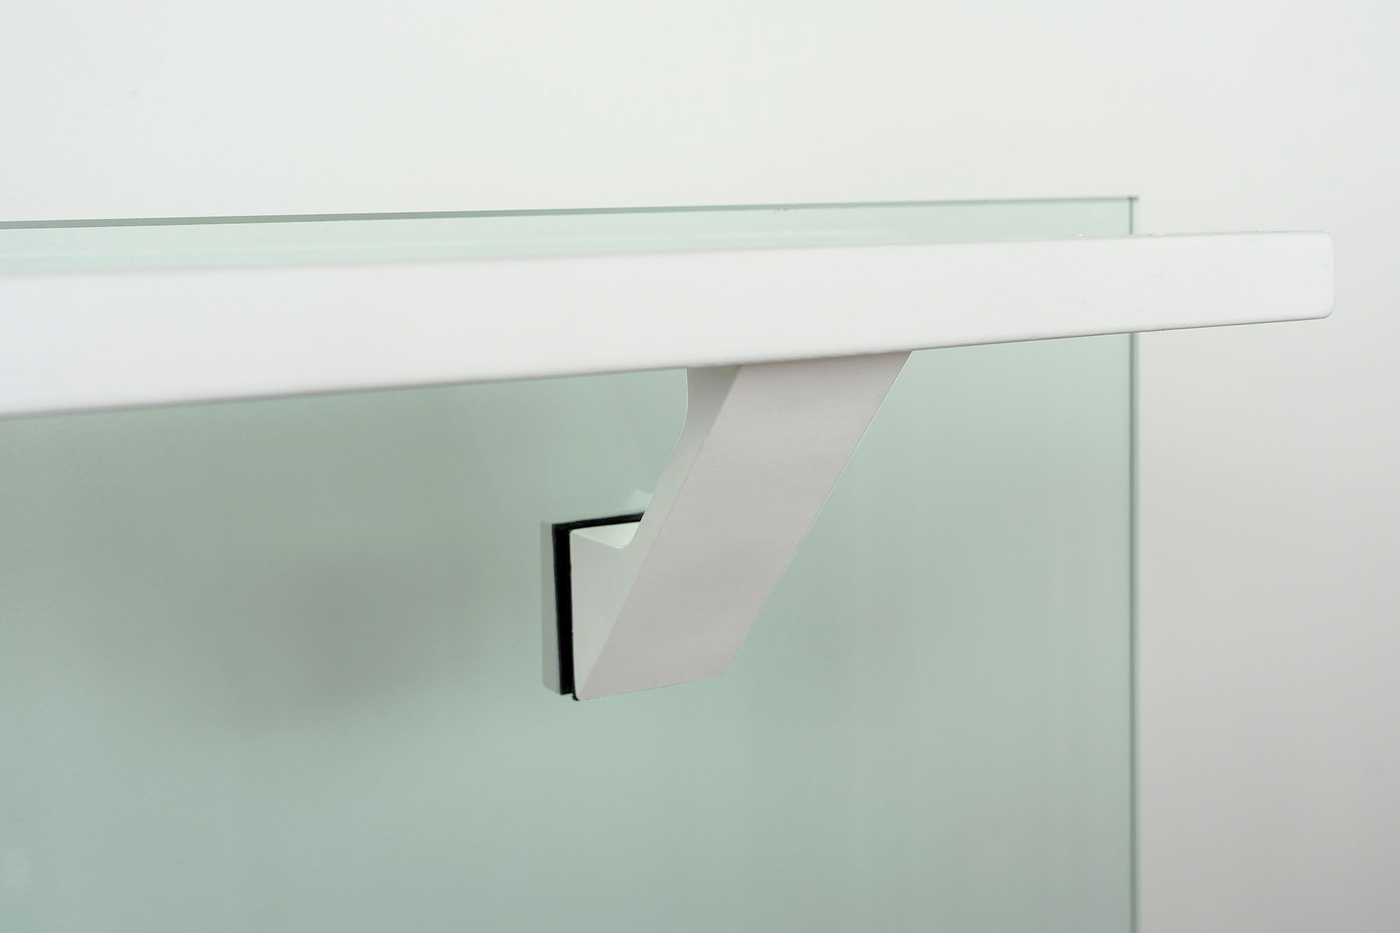 Modern-white-glass-mounted-handrail-bracket